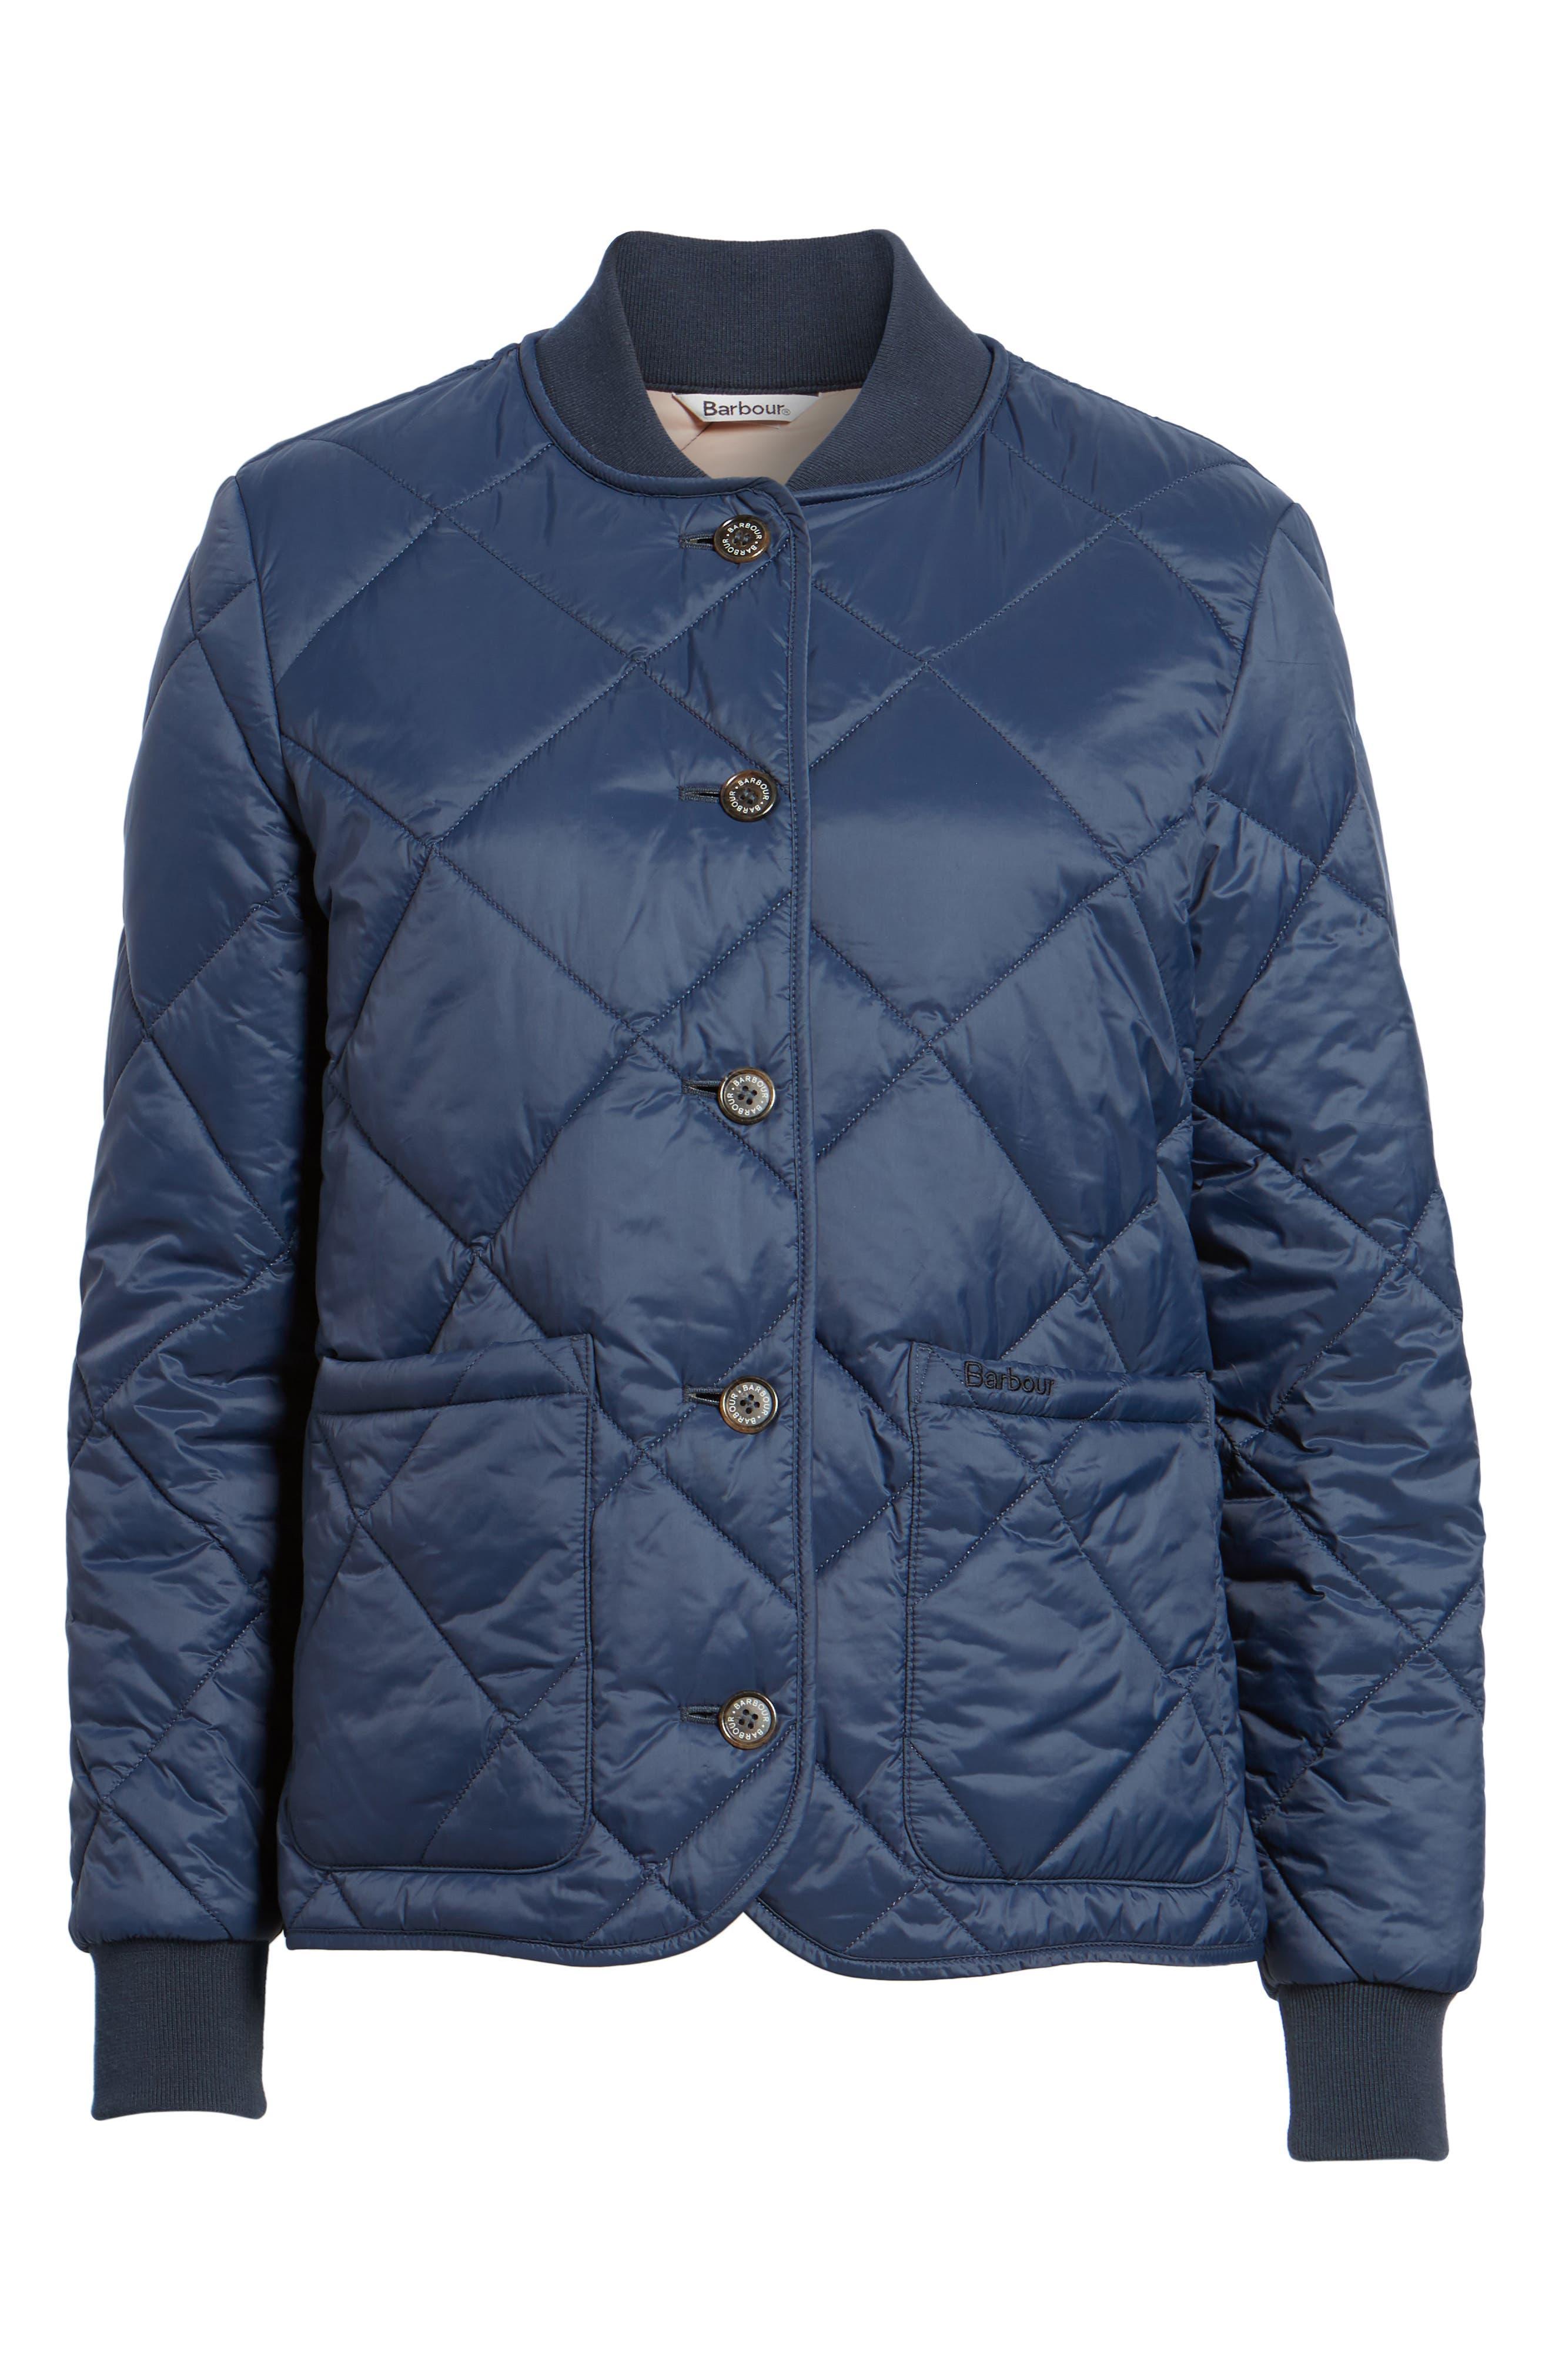 Freckleton Jacket,                             Alternate thumbnail 6, color,                             Royal Navy